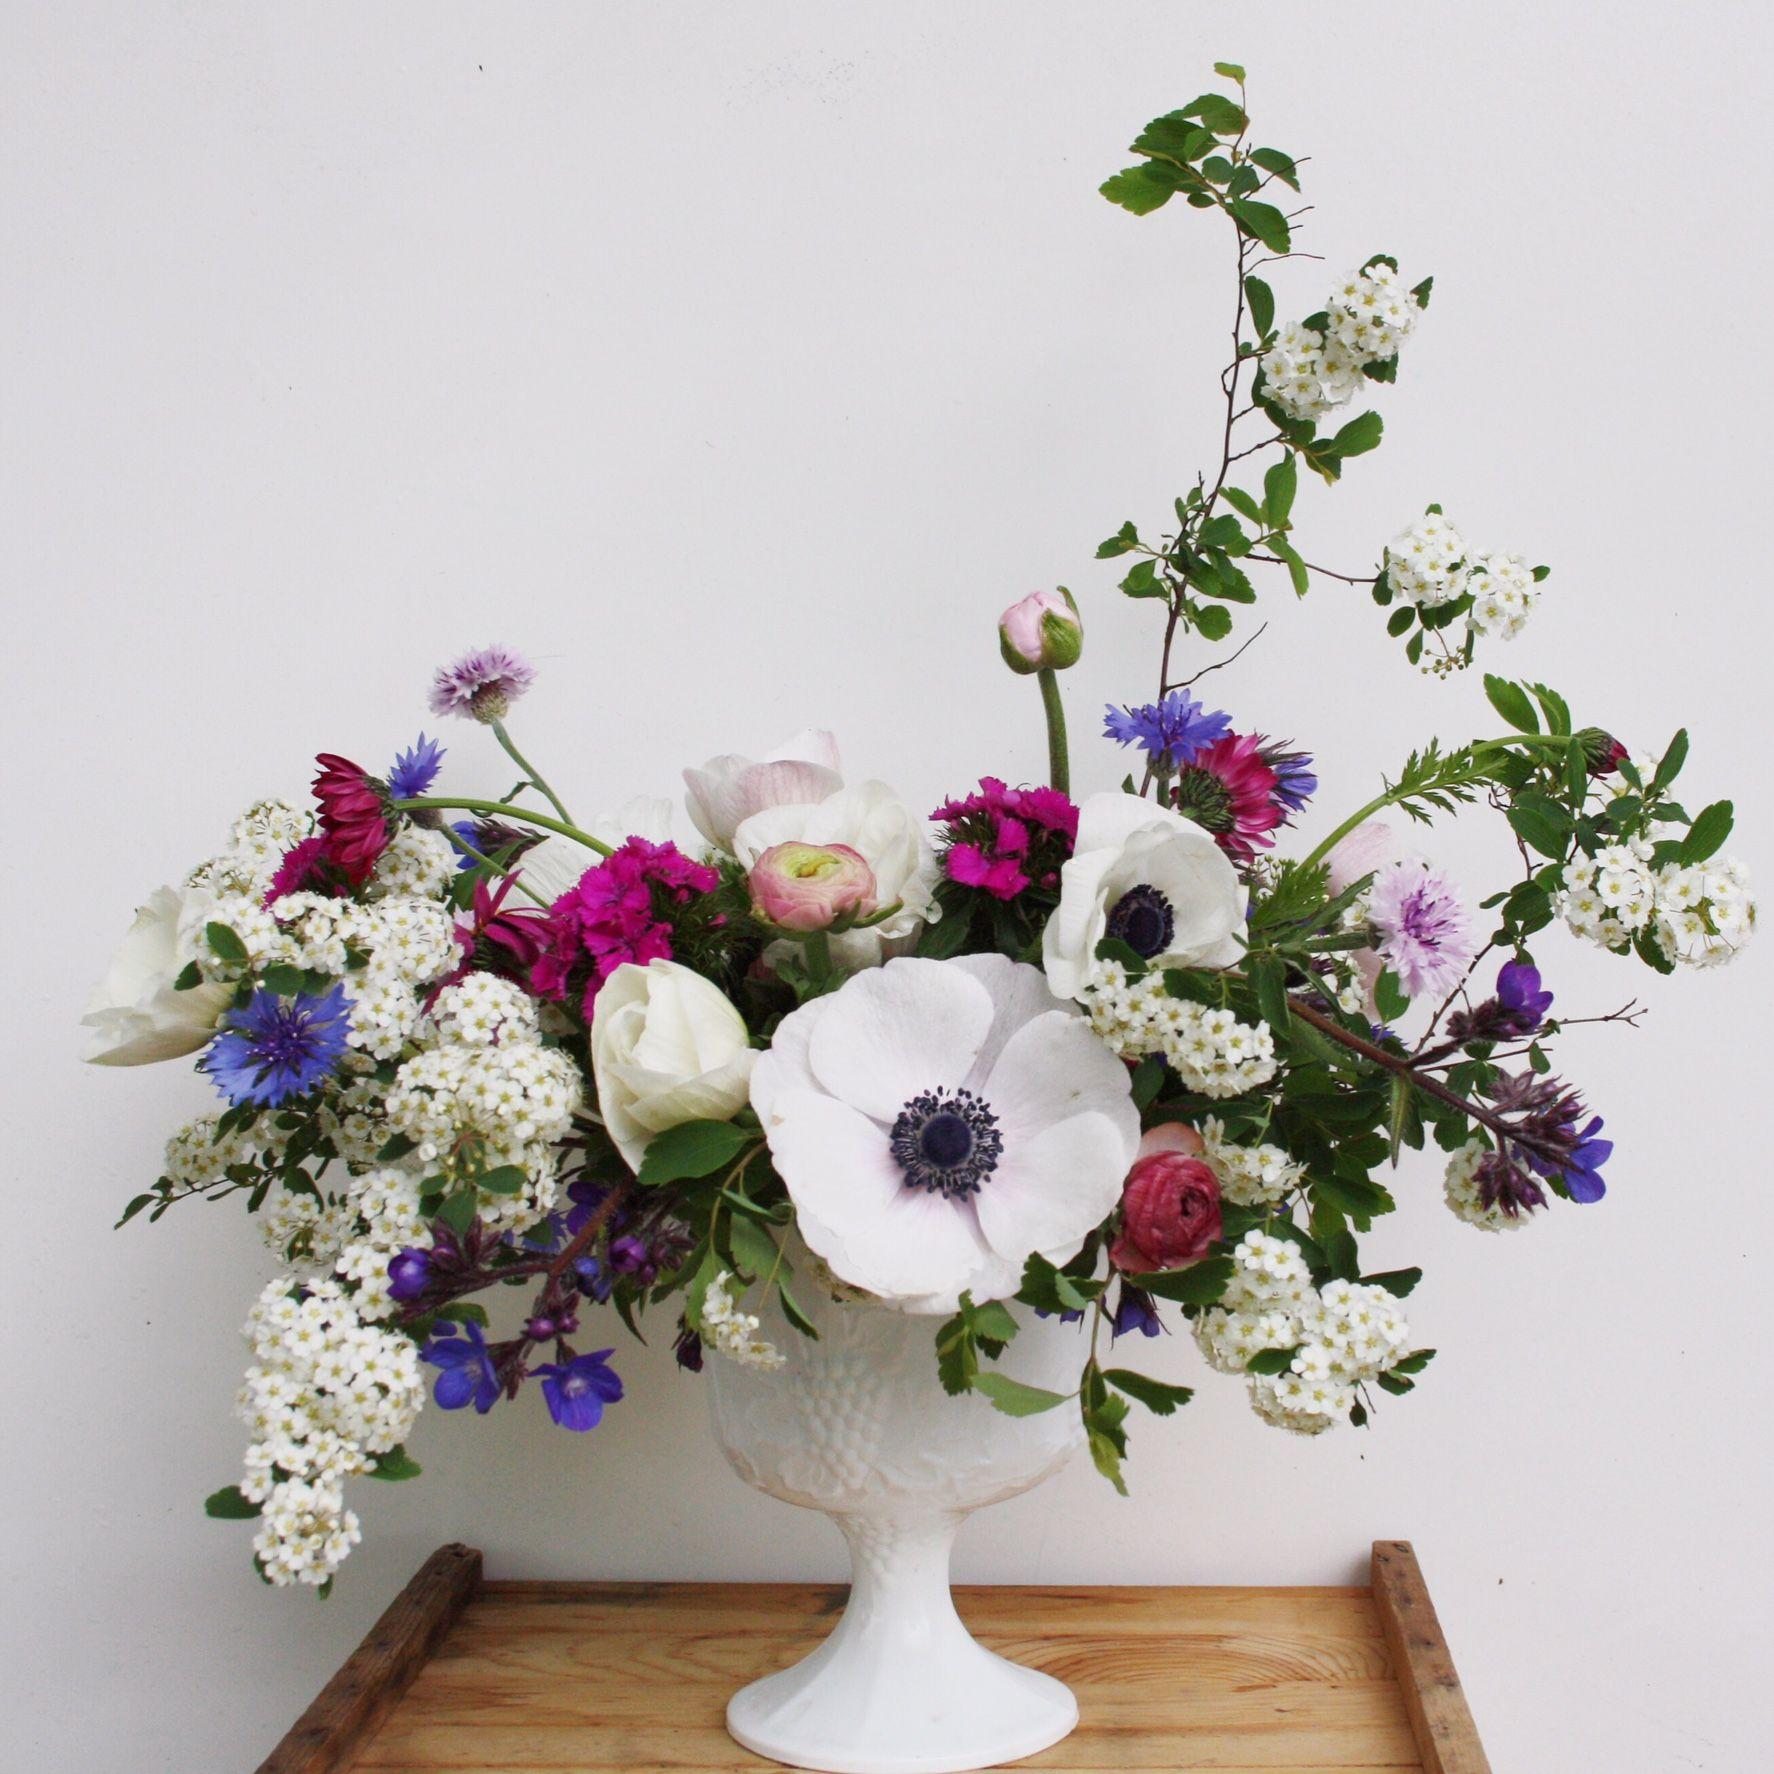 Pretty Spring Flower Design Love The Airiness Of Bridal Veil Spores